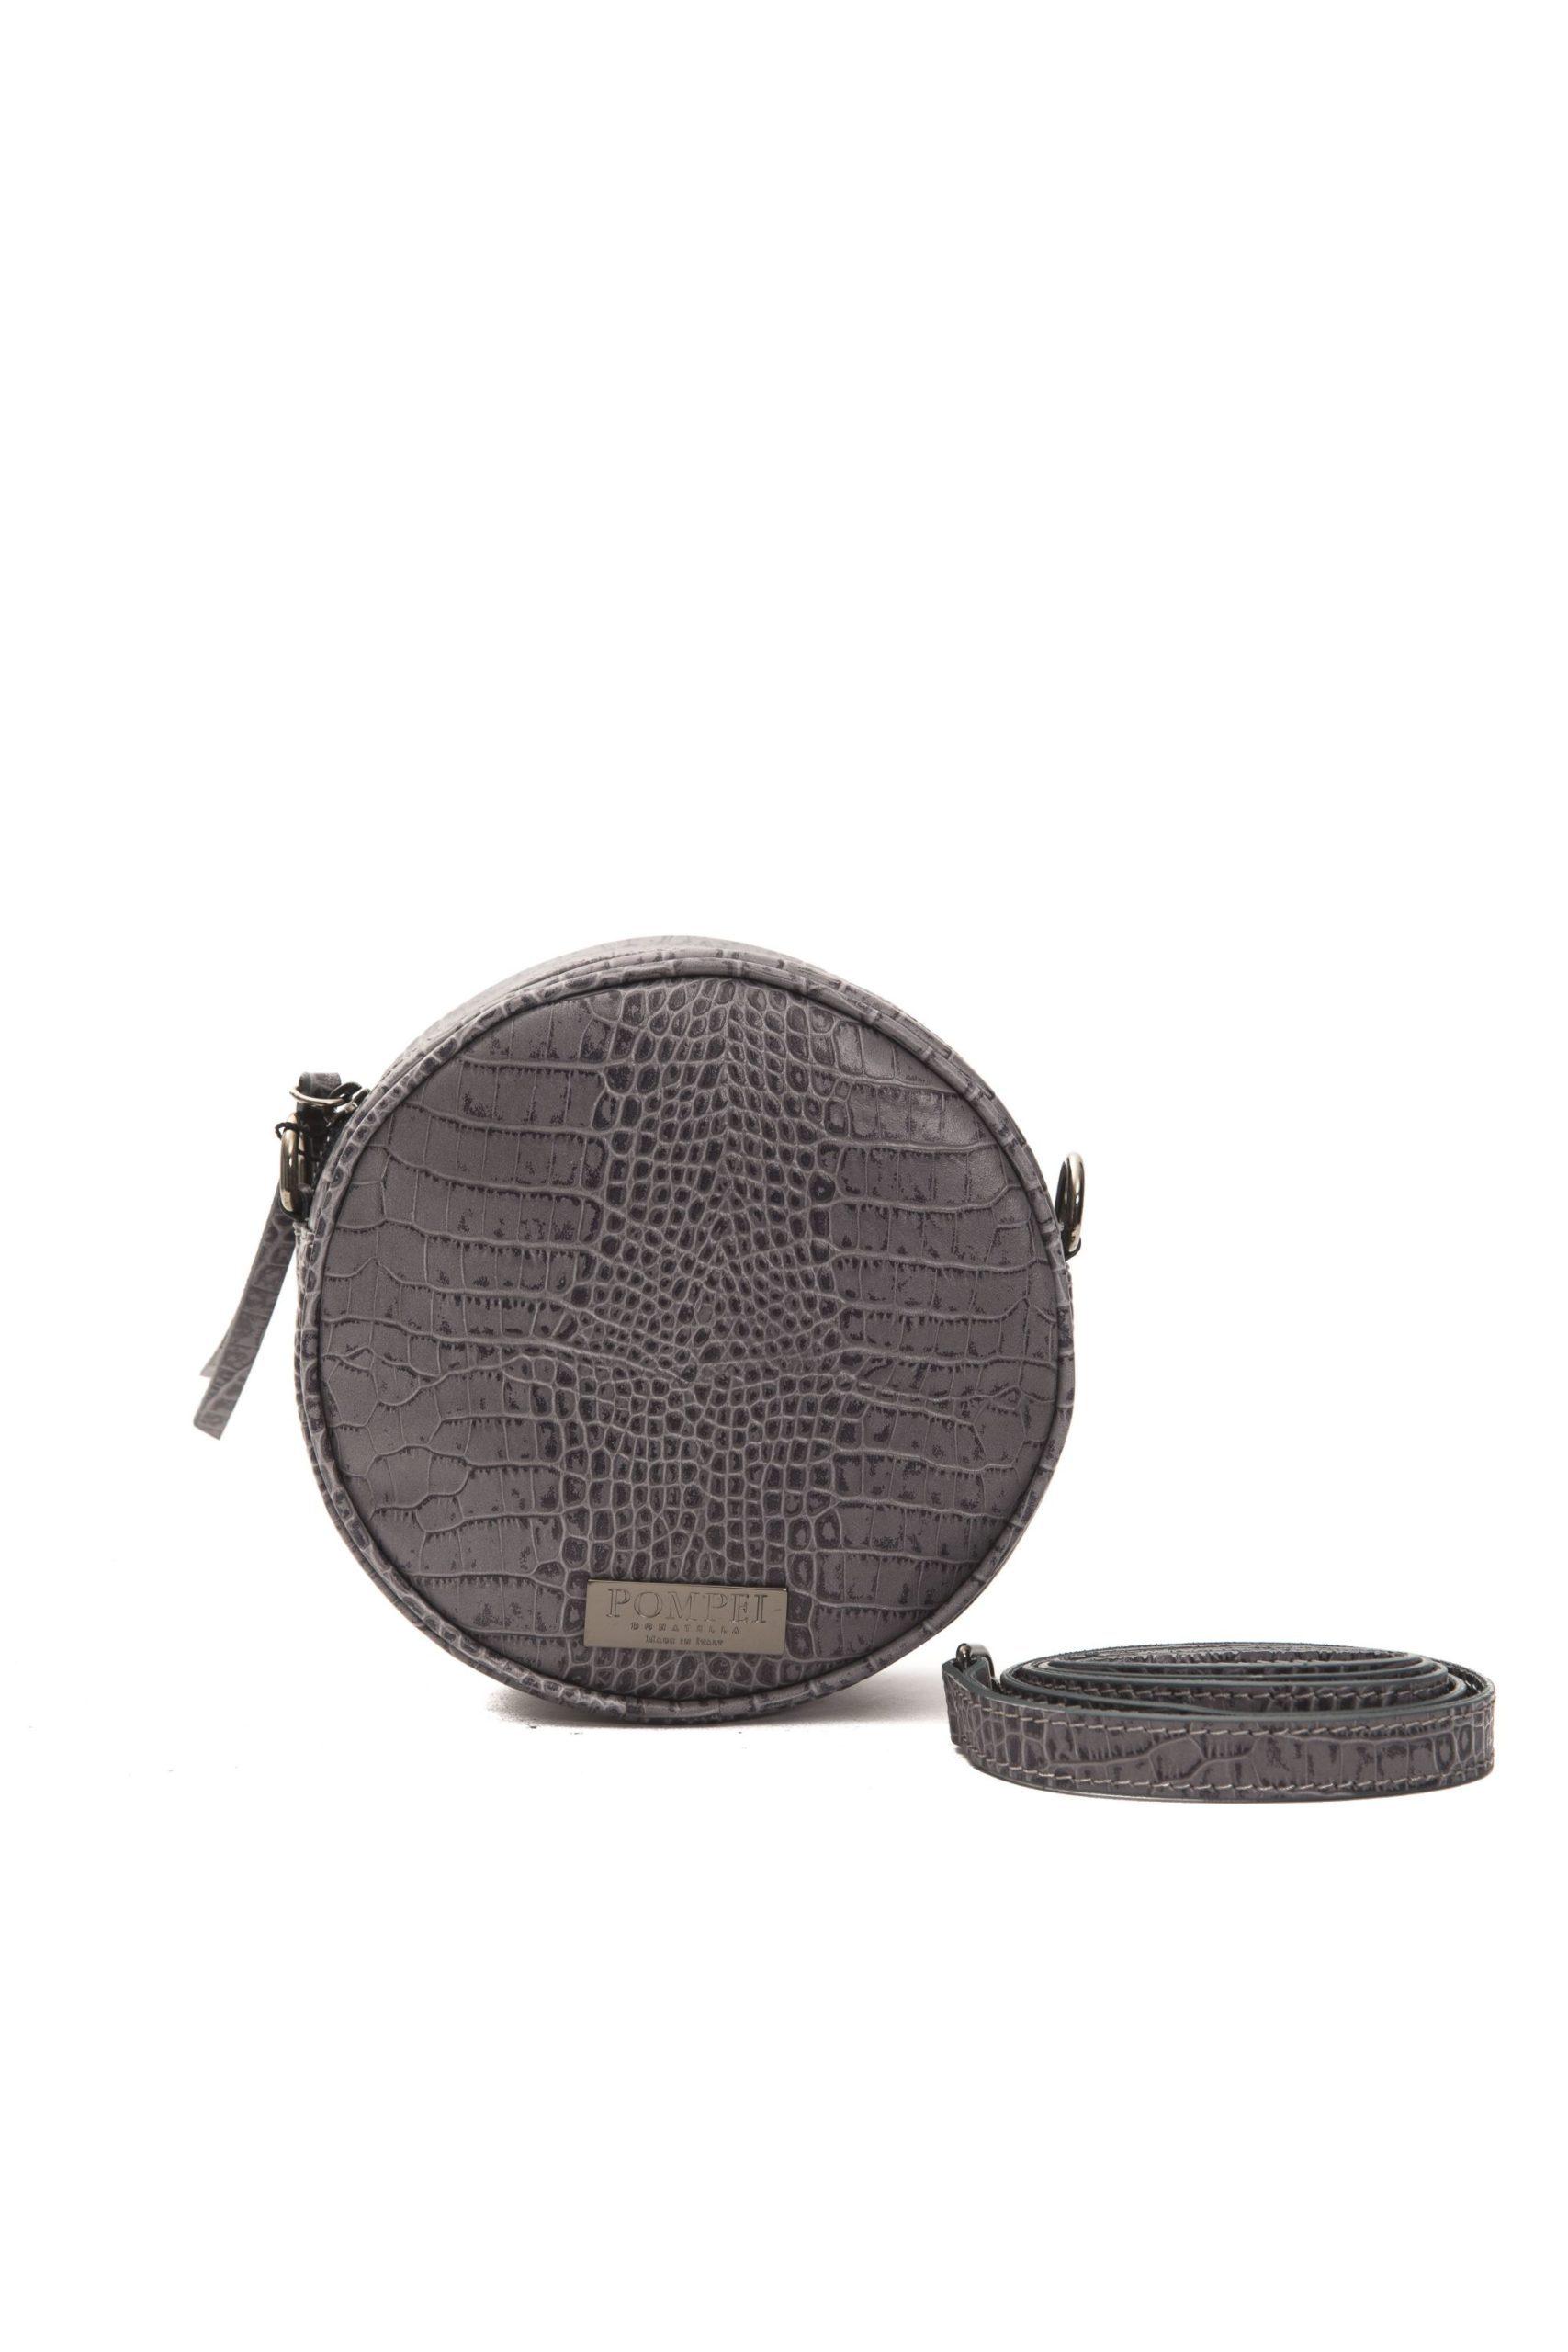 Pompei Donatella Women's Grigio Crossbody Bag Grey PO1004367